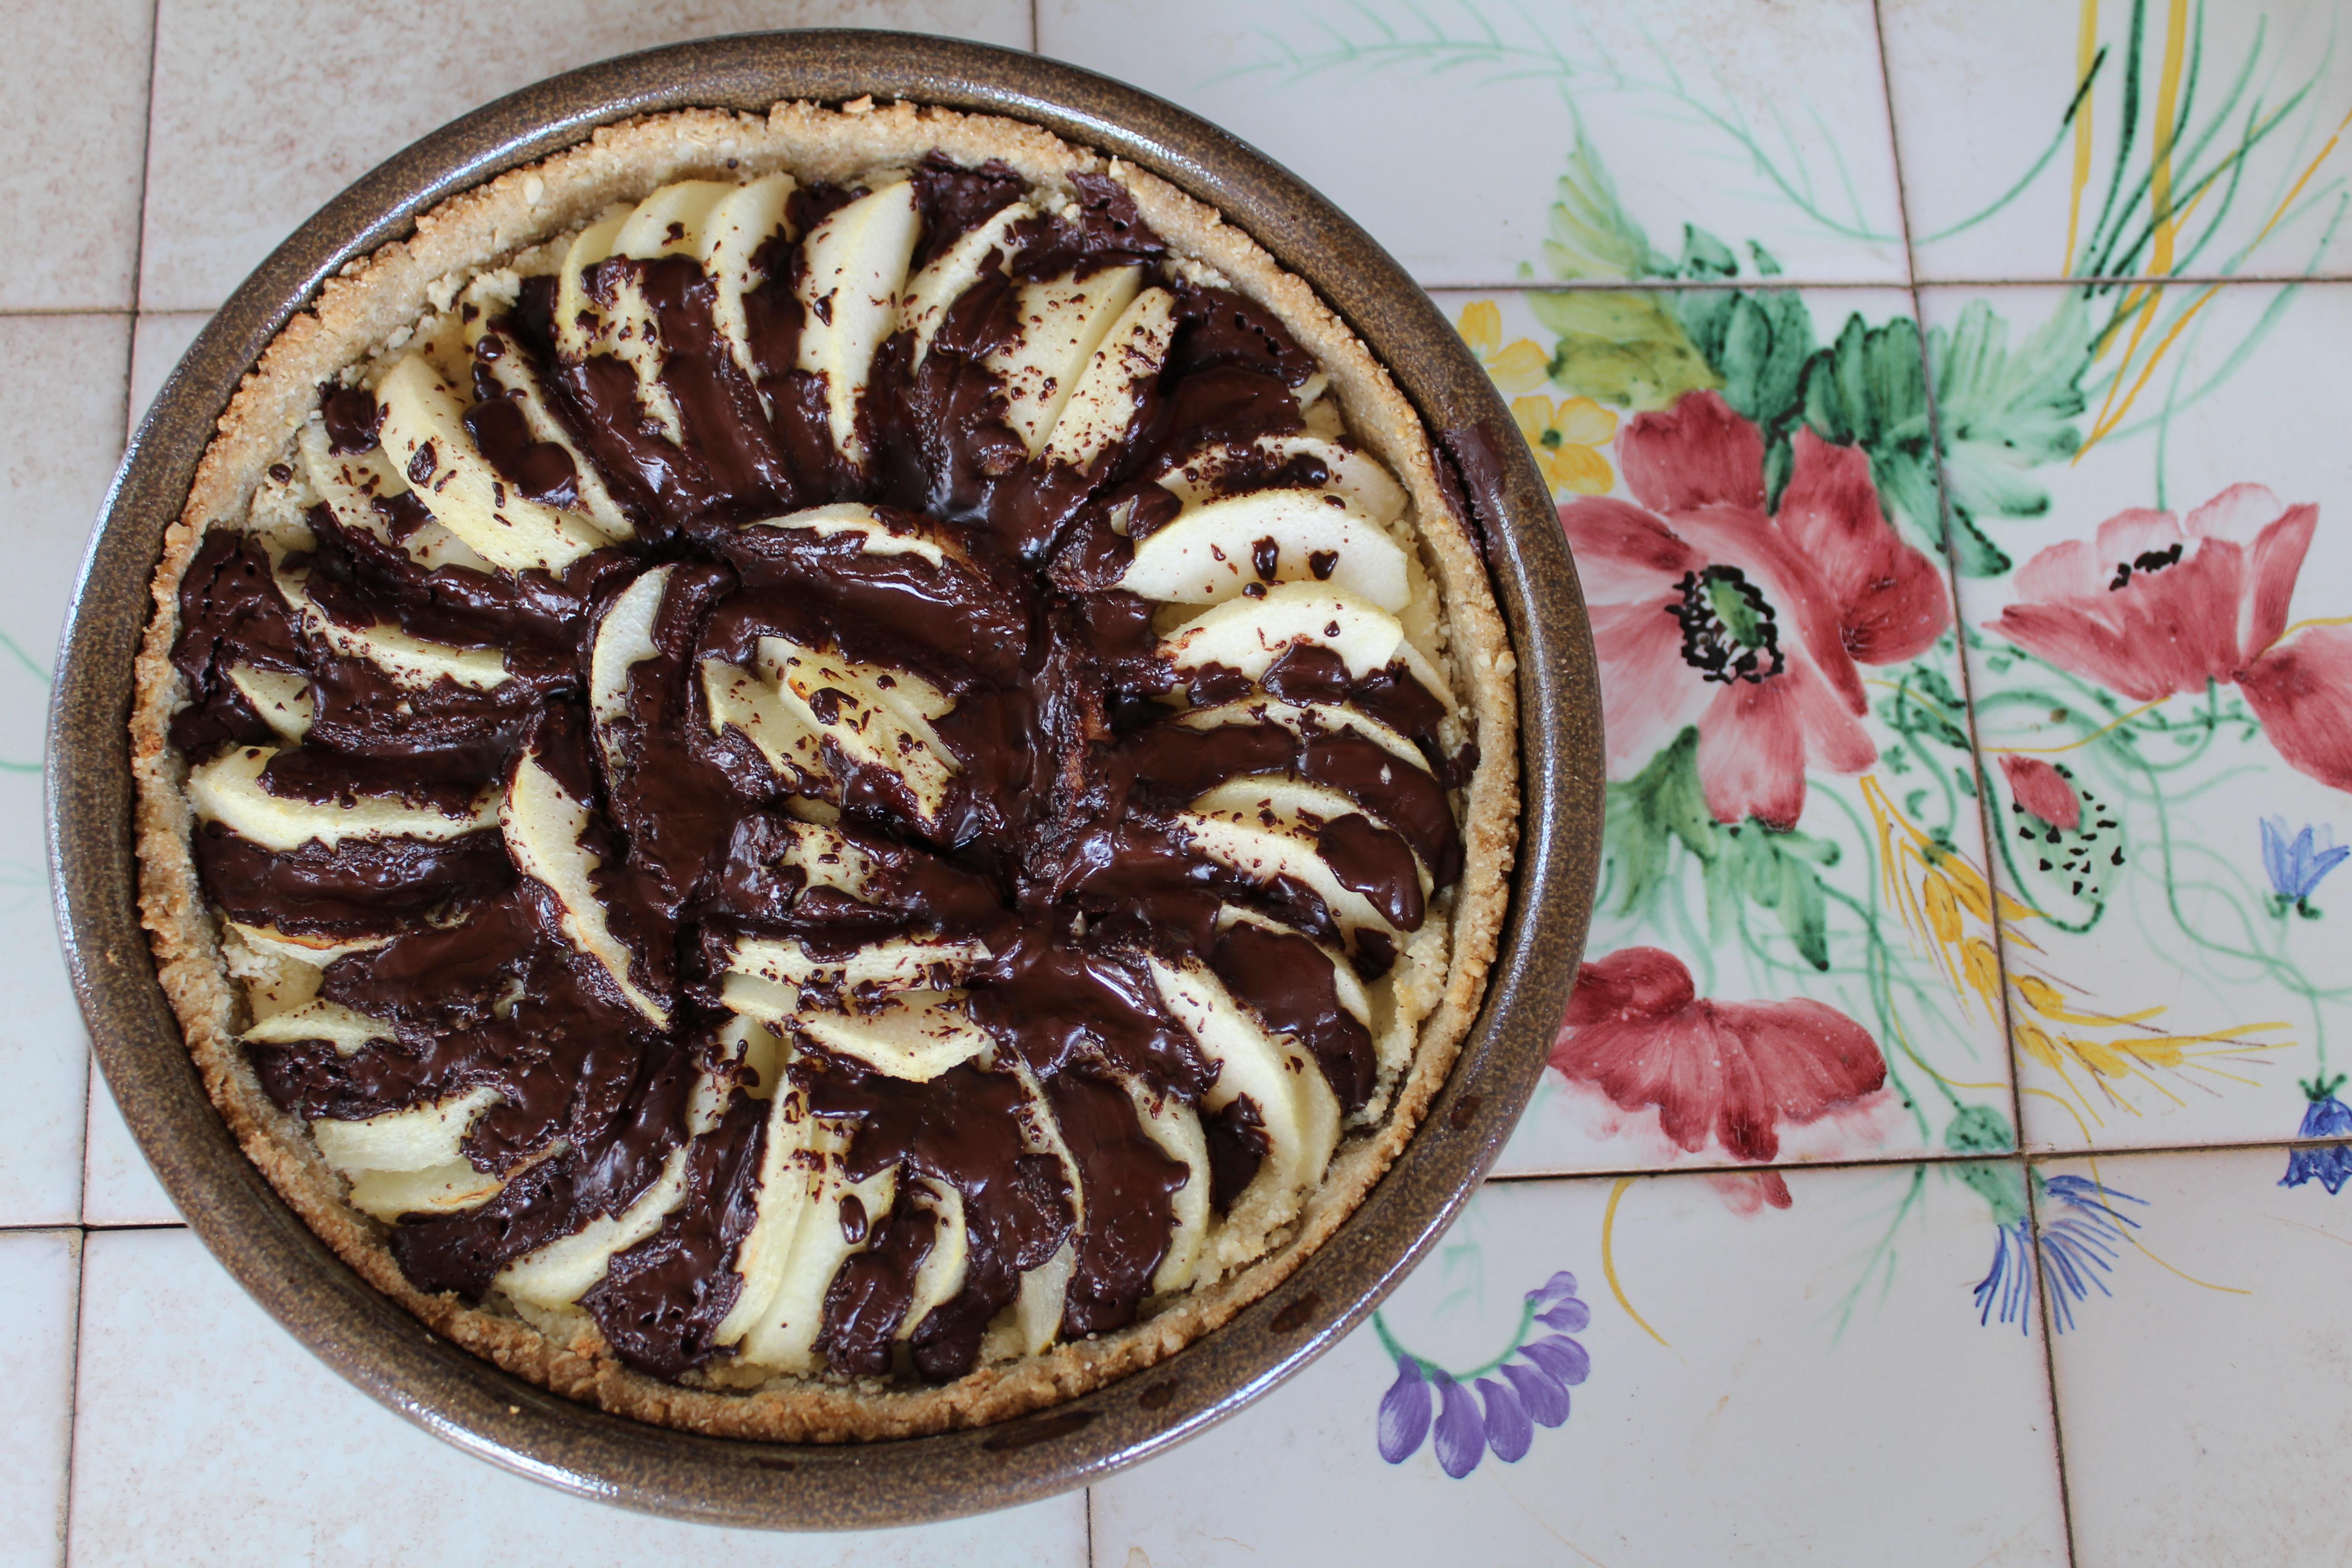 Vegansk pæretærte med marcipan og chokolade